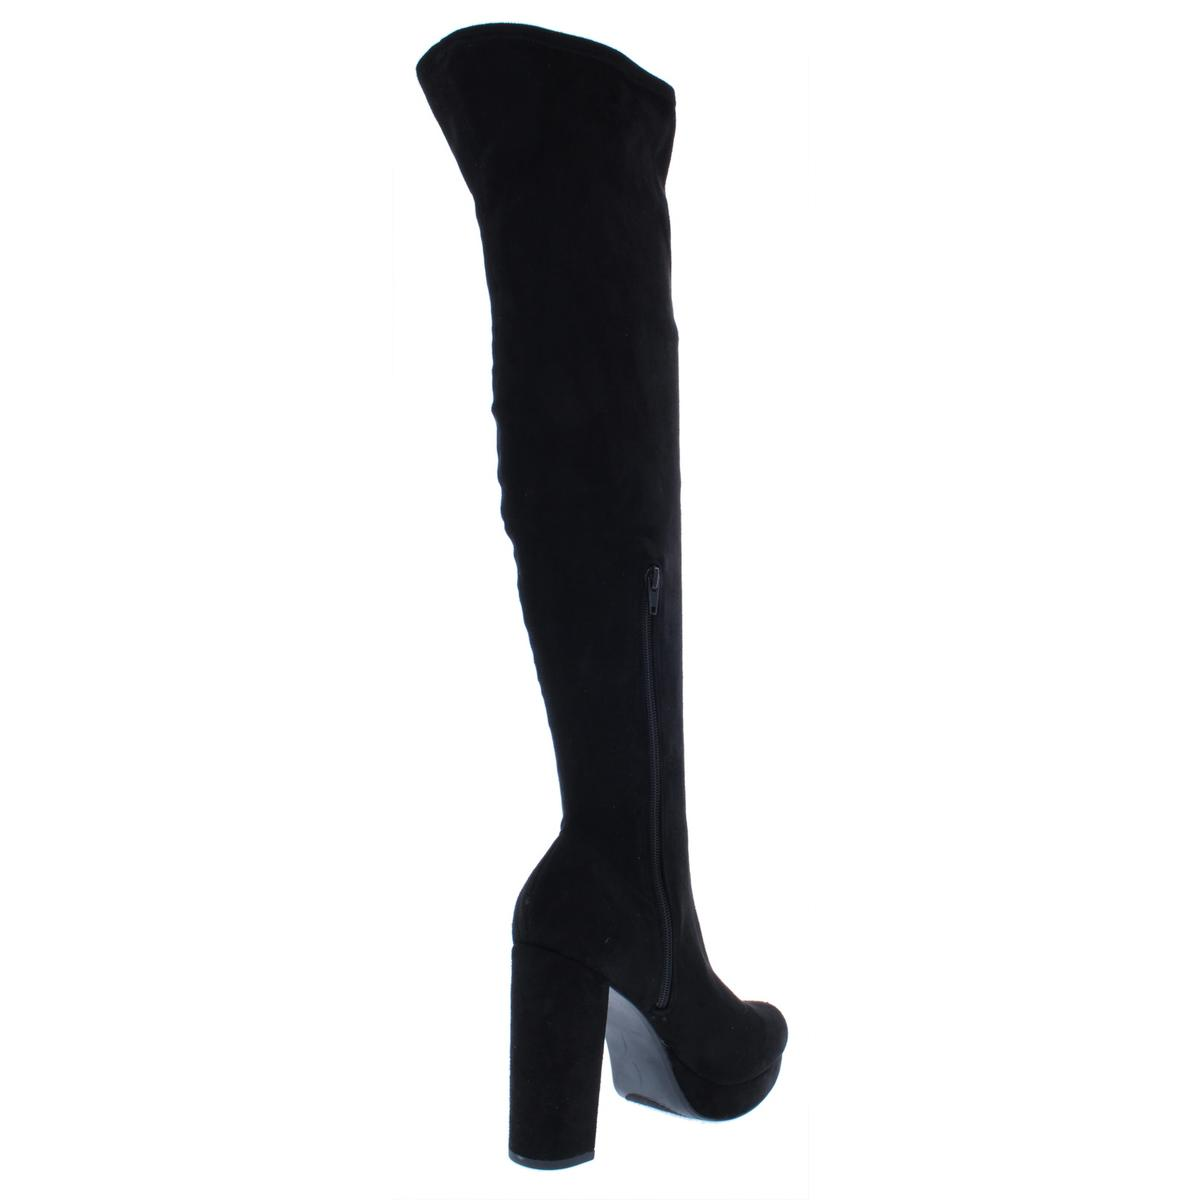 Madden Girl Womens Groupie Tall Over-The-Knee Boots Heels BHFO 5567